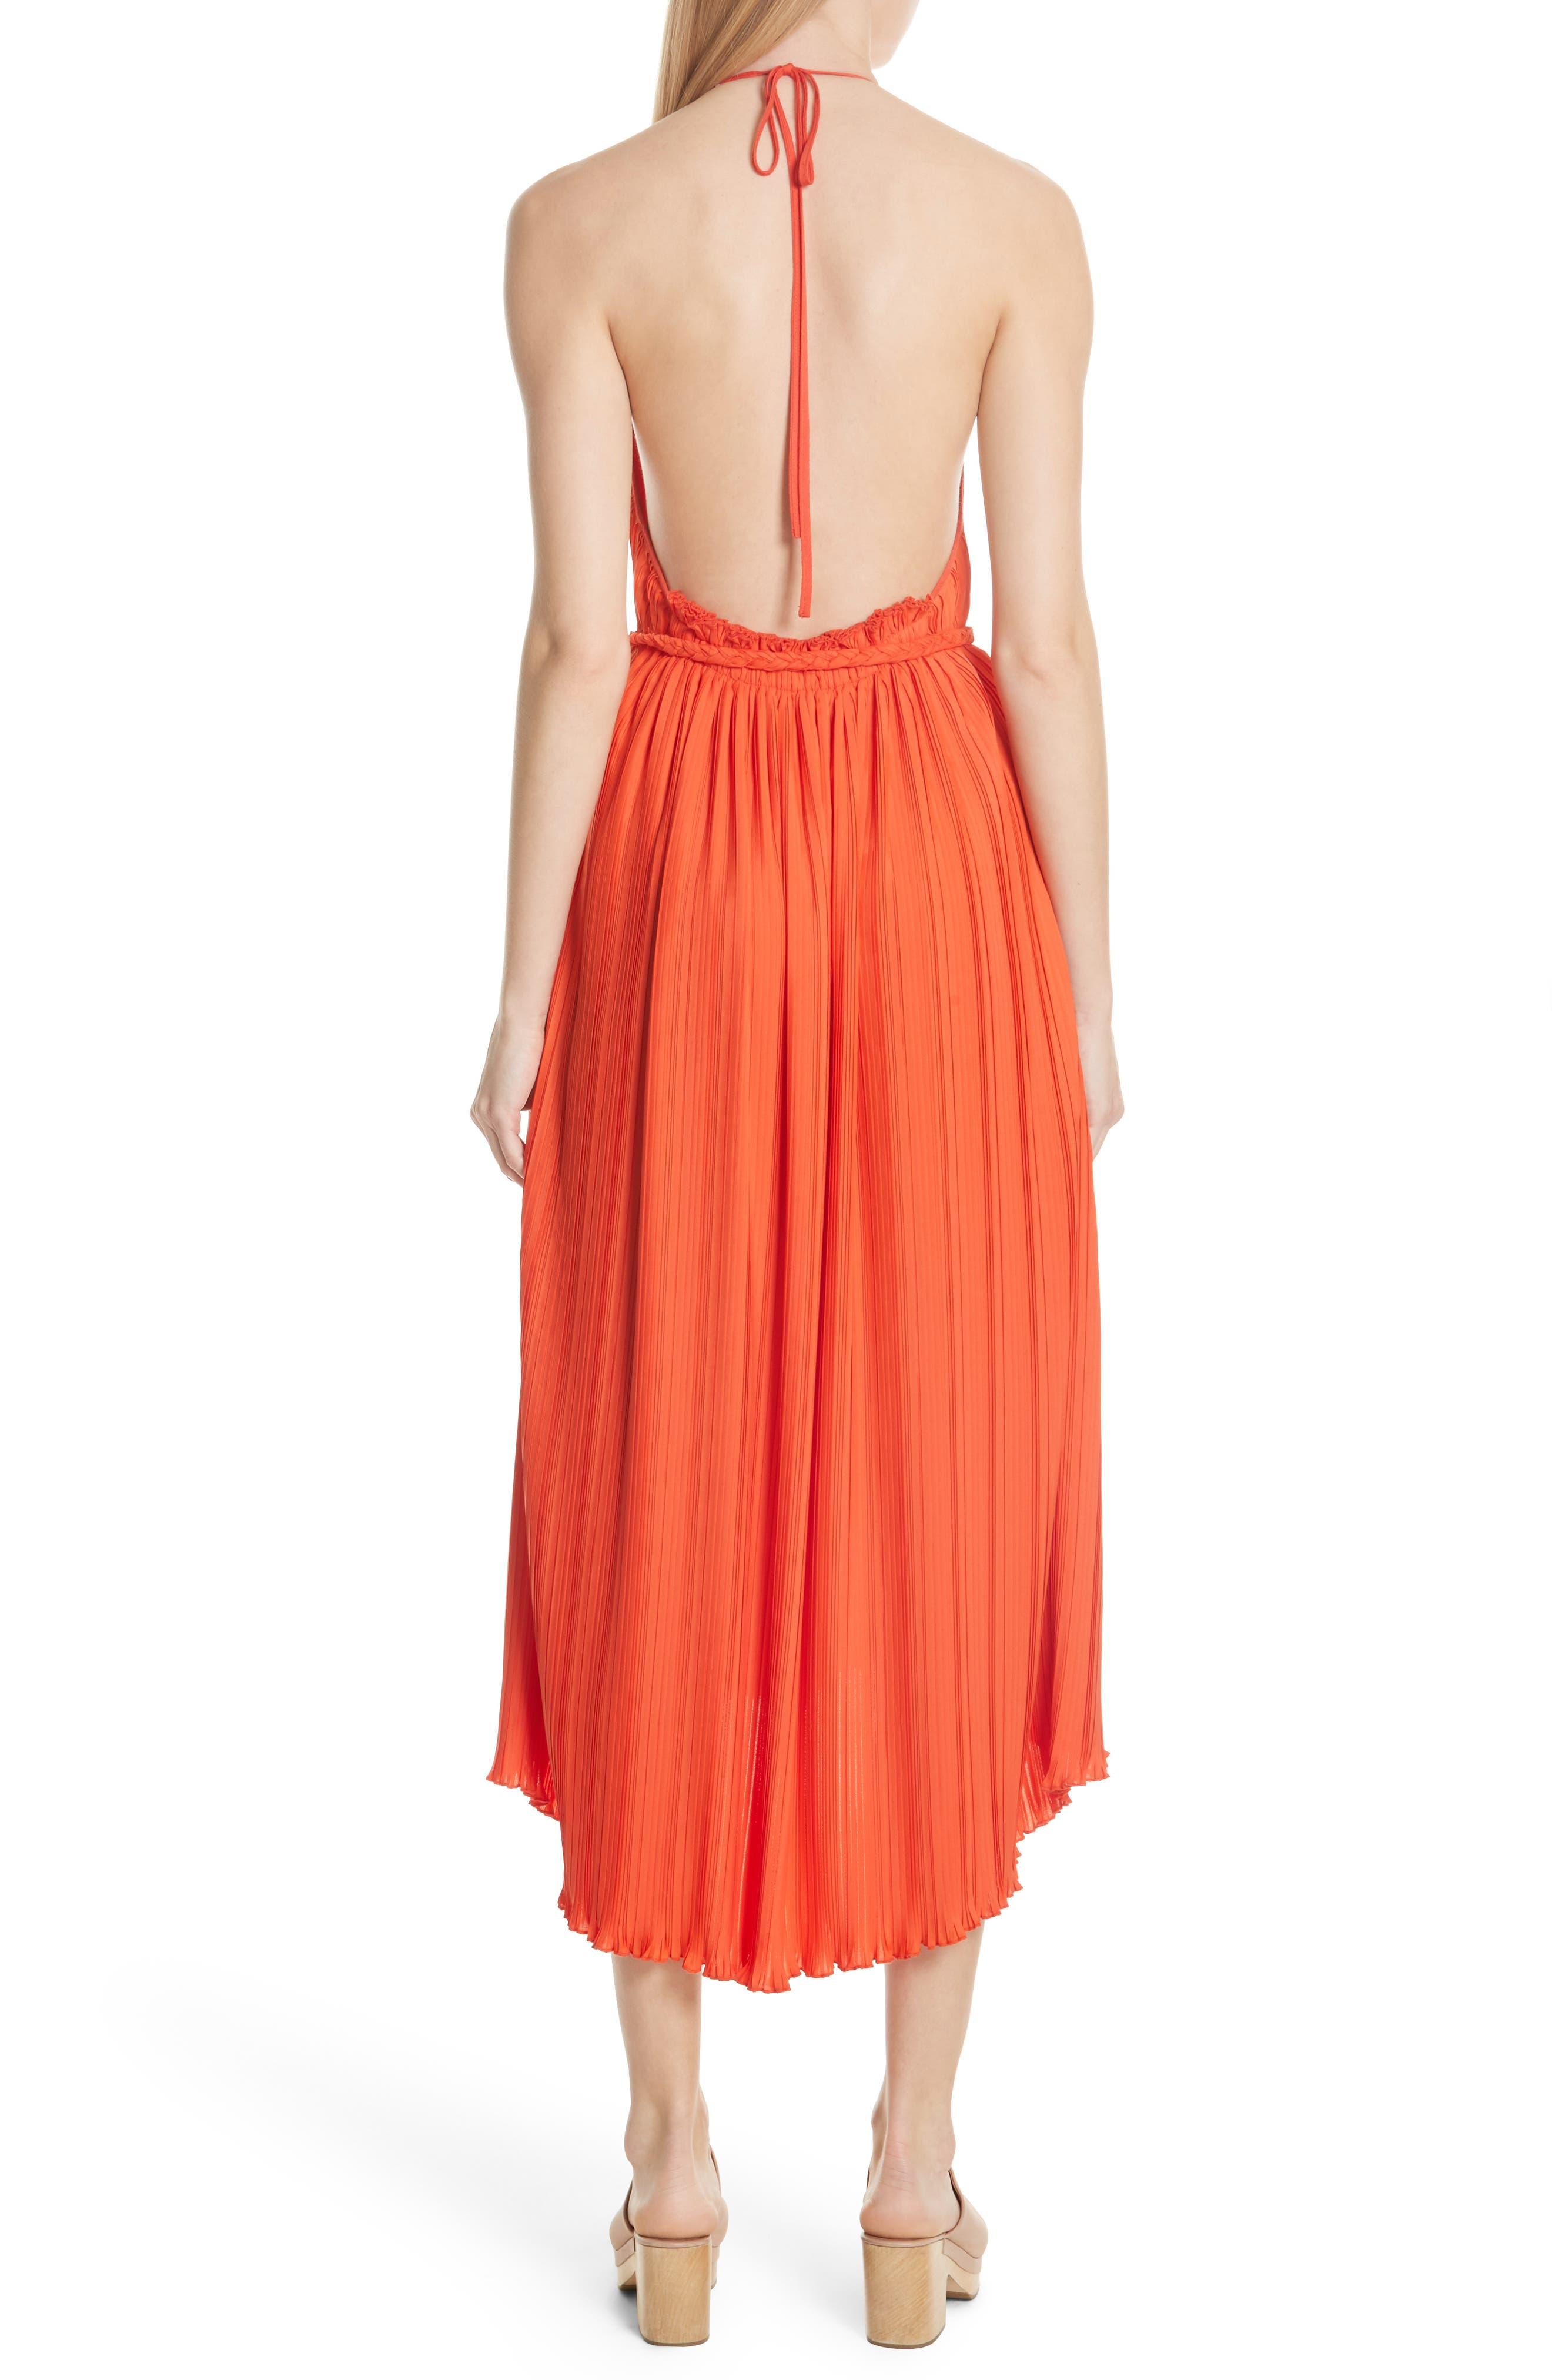 RACHEL COMEY,                             Sambuca Halter Dress,                             Alternate thumbnail 2, color,                             959